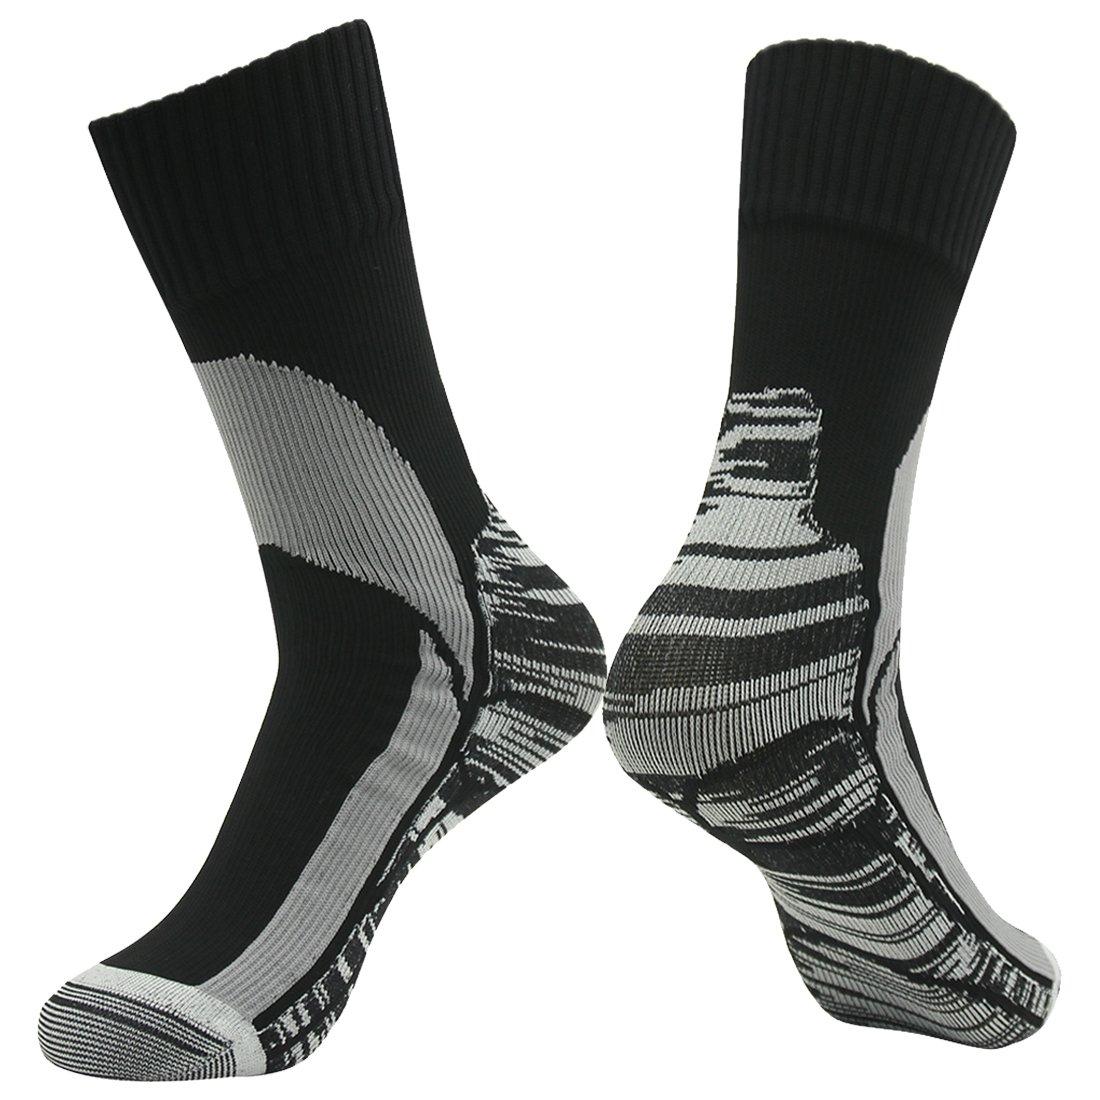 Waterproof Golf Socks, RANDY SUN Men's Breathable Ventilated Cushioned Quarter Trekking Mid Calf Socks XS by RANDY SUN